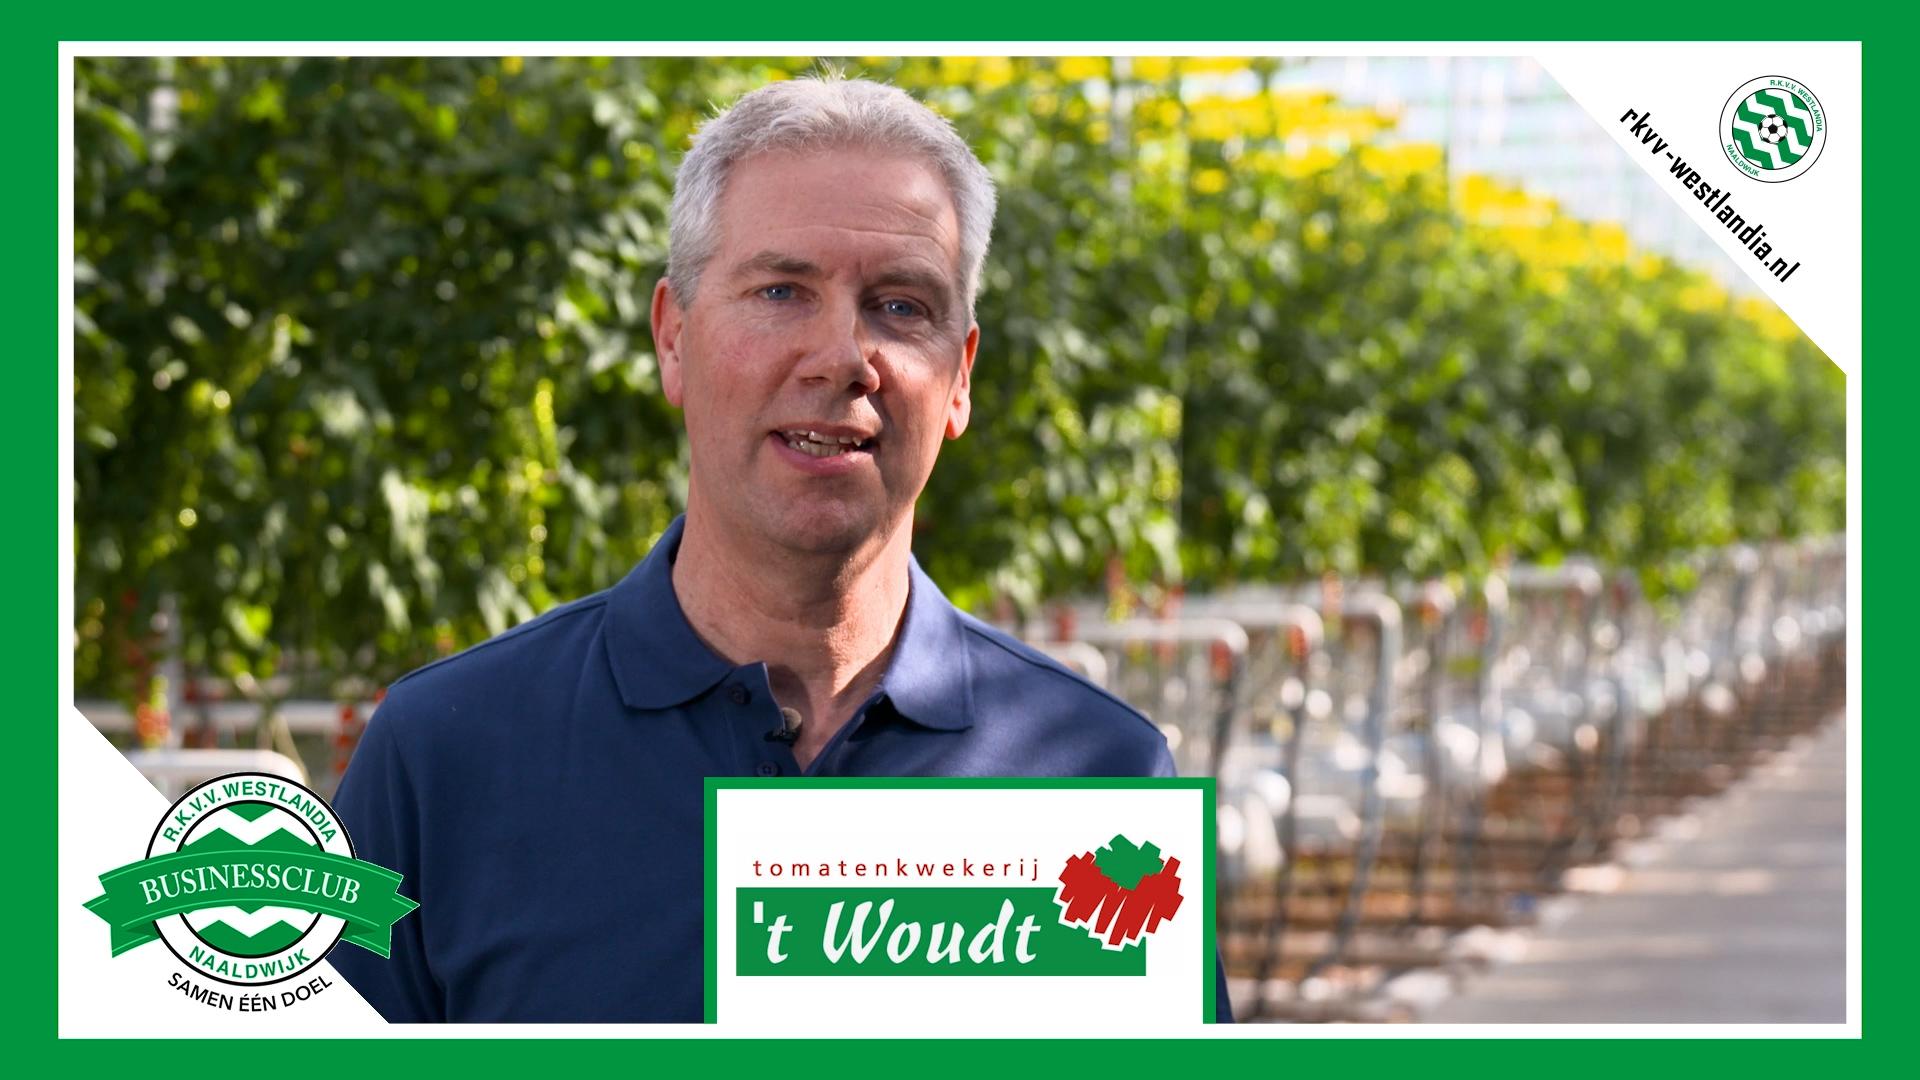 Kwekerij 't Woudt X Westlandia - 'Gedreven tomatentelers en fanatieke sportliefhebbers'